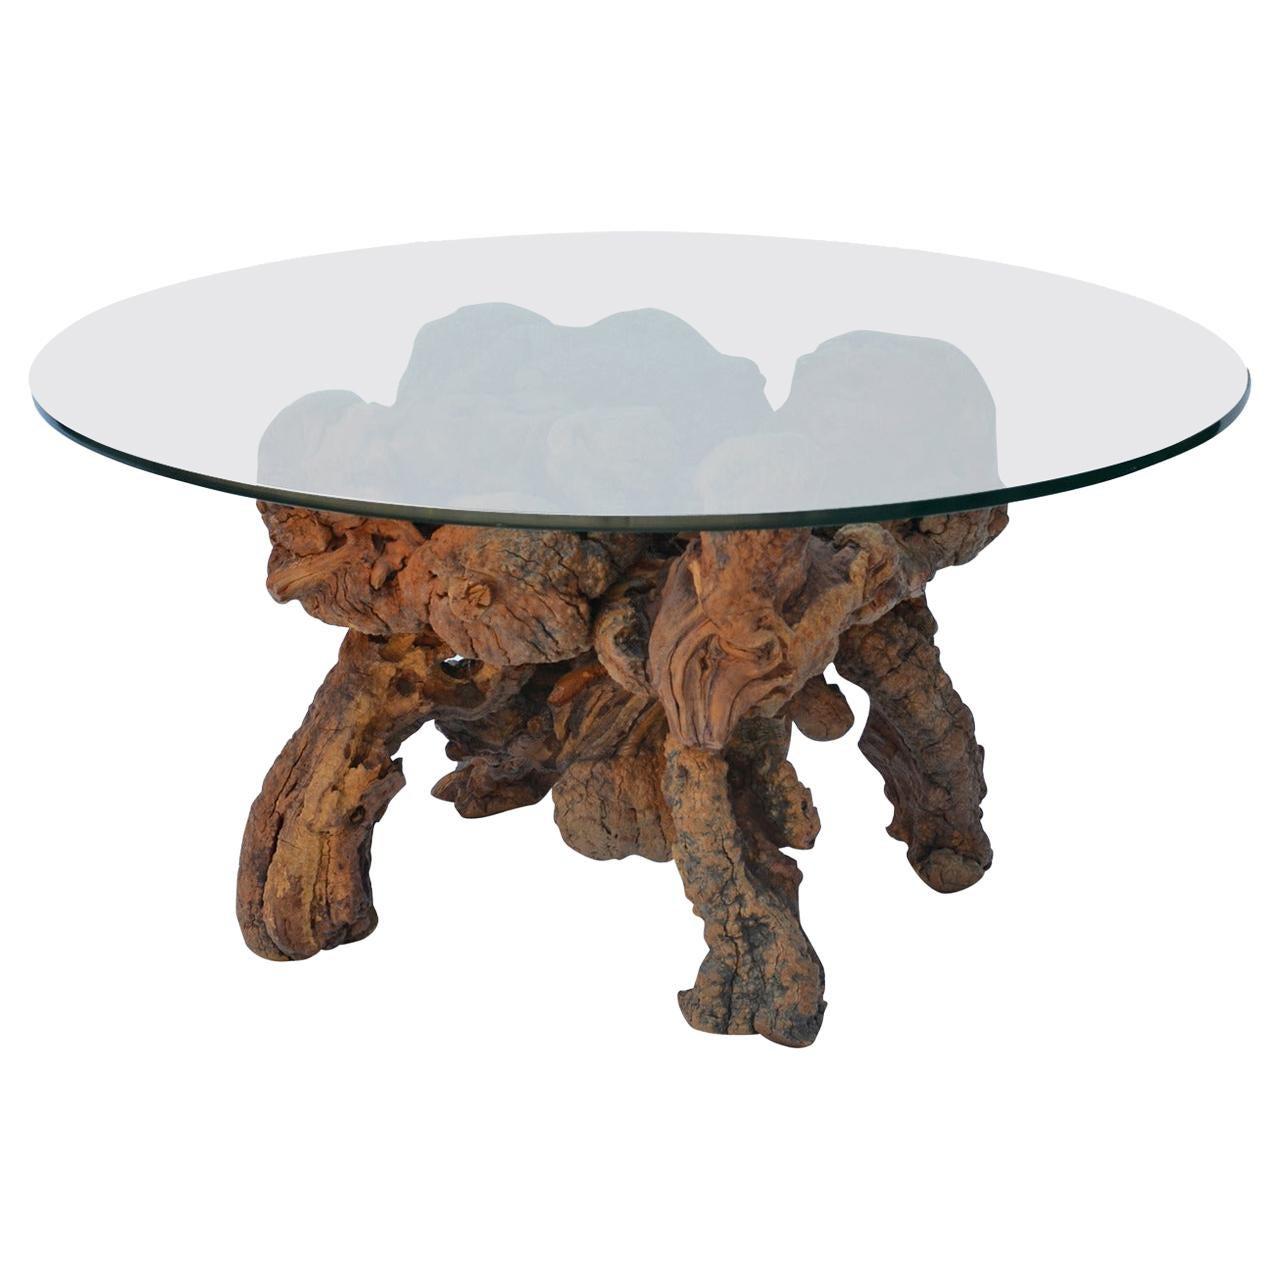 Organic Modern Quadripod Bog Wood and Glass Coffee Table